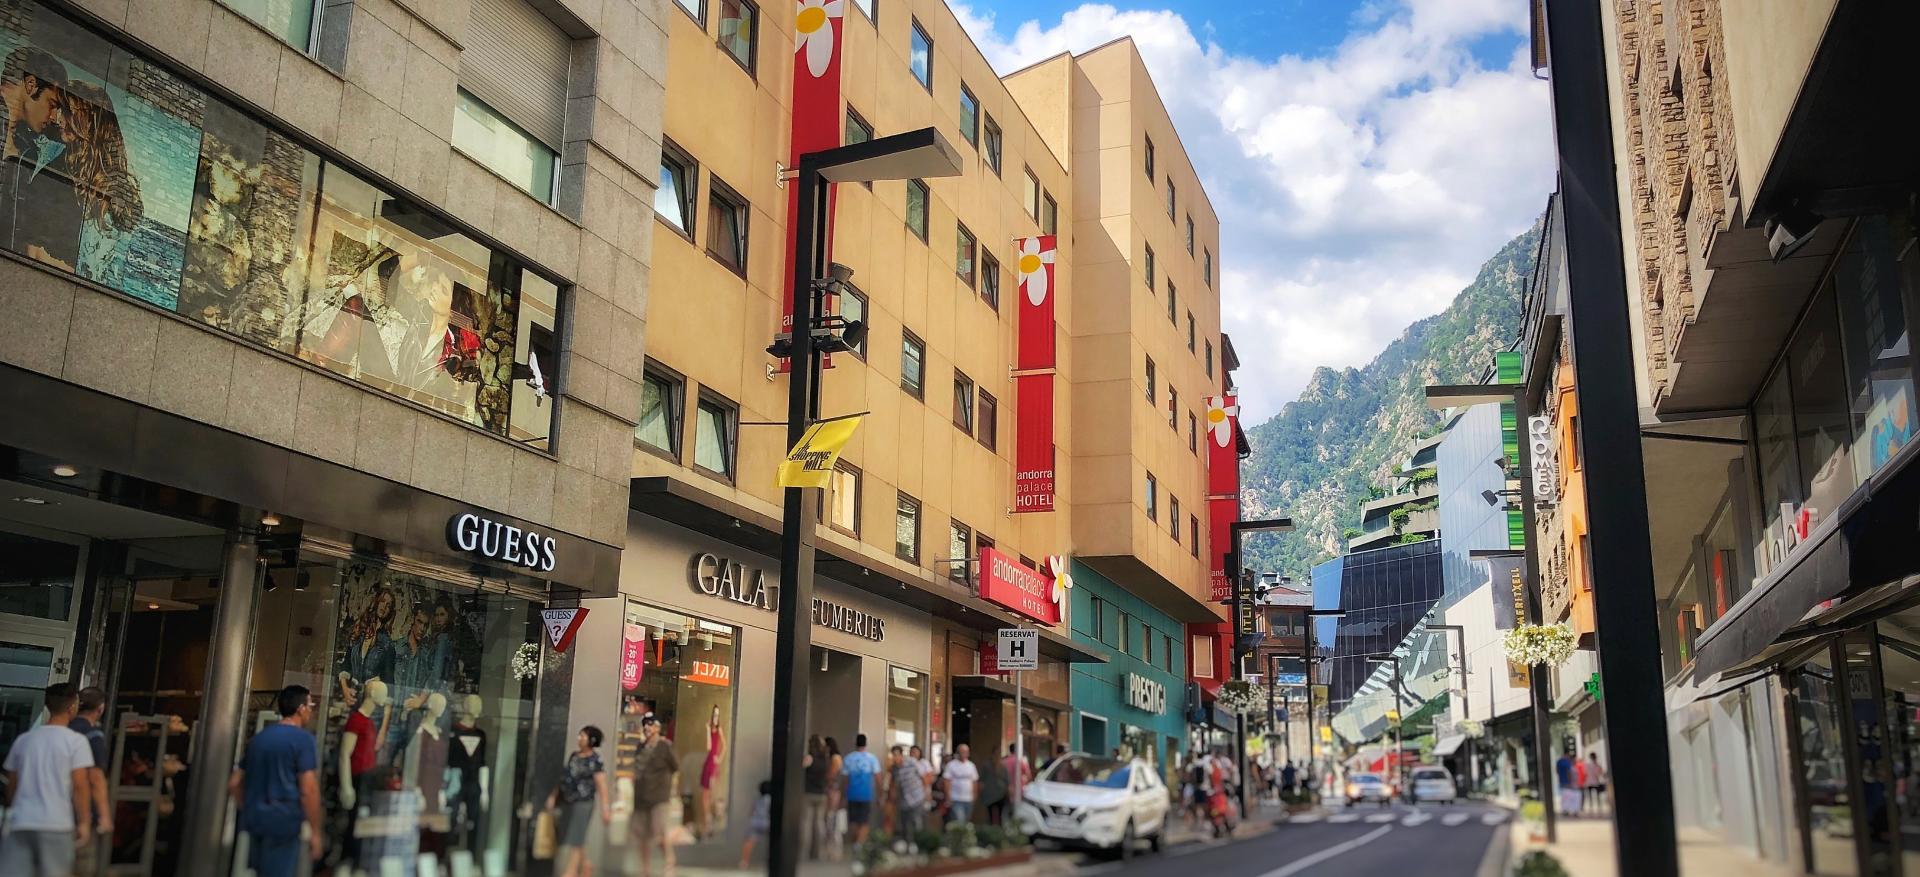 3-star hotel downtown Andorra la Vella